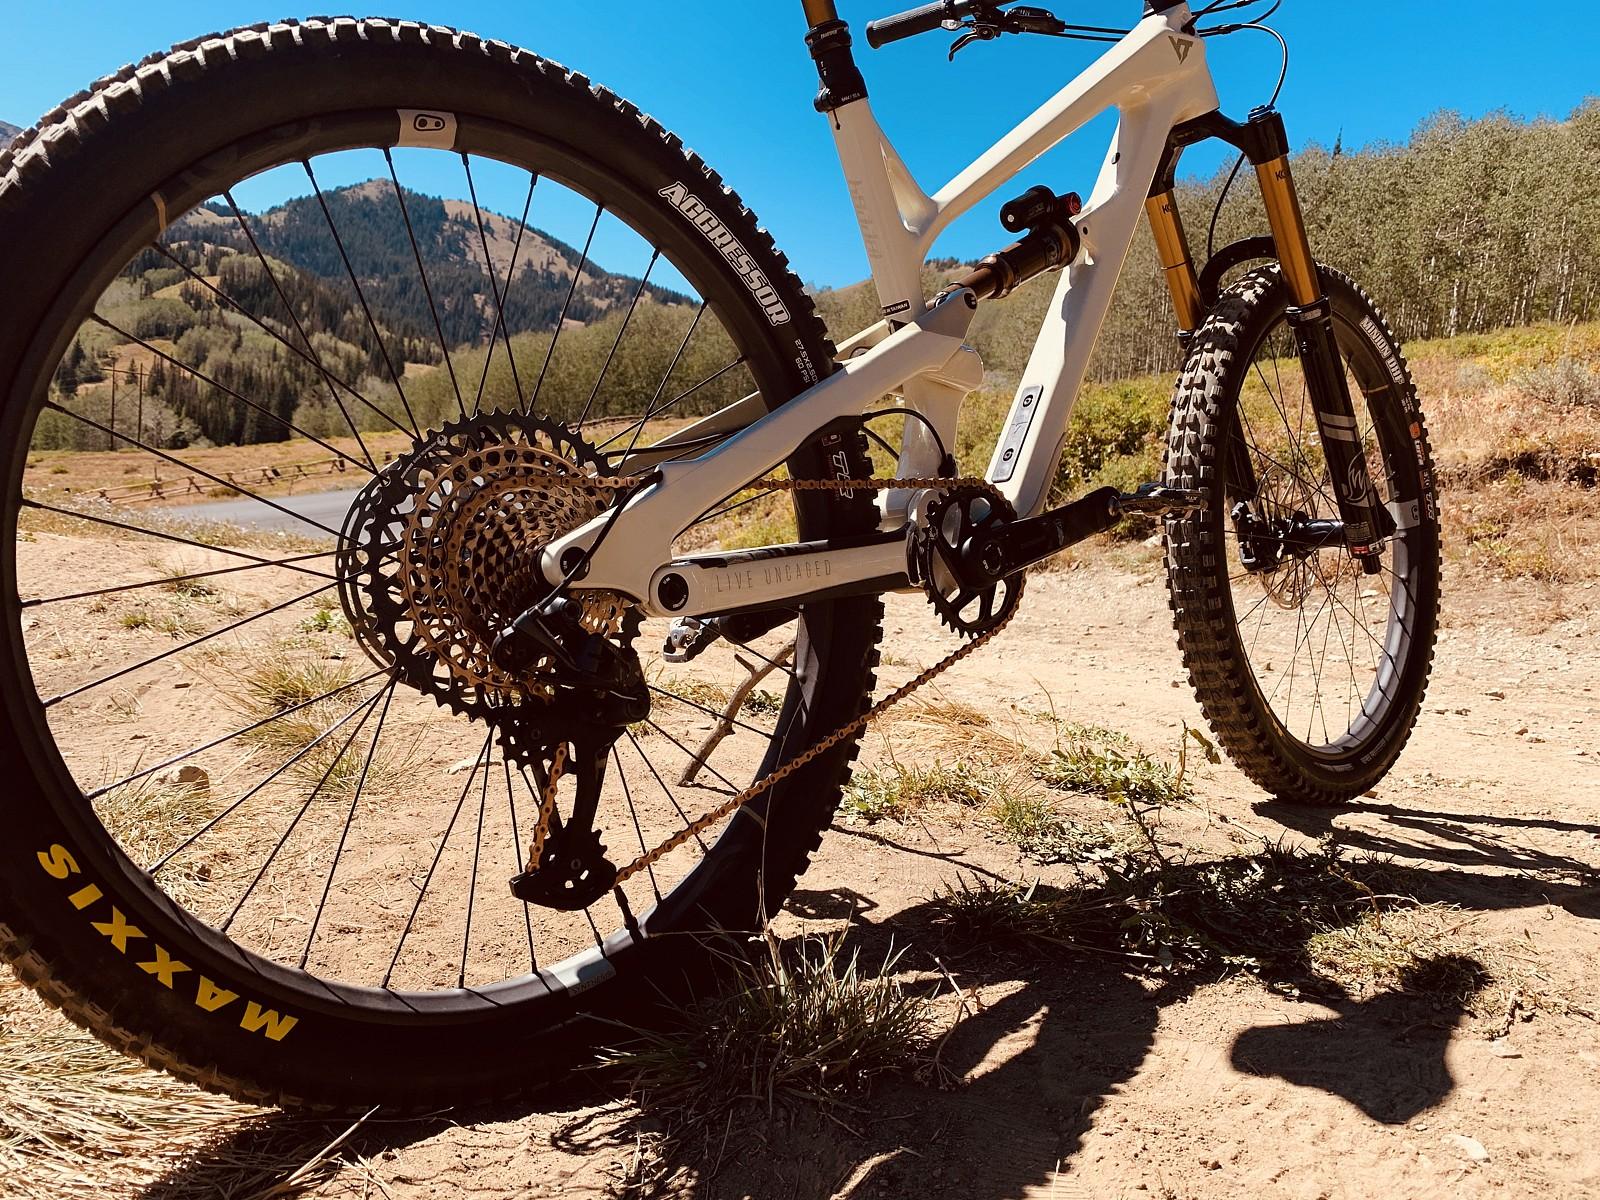 IMG E0214 - jaykalafatis - Mountain Biking Pictures - Vital MTB